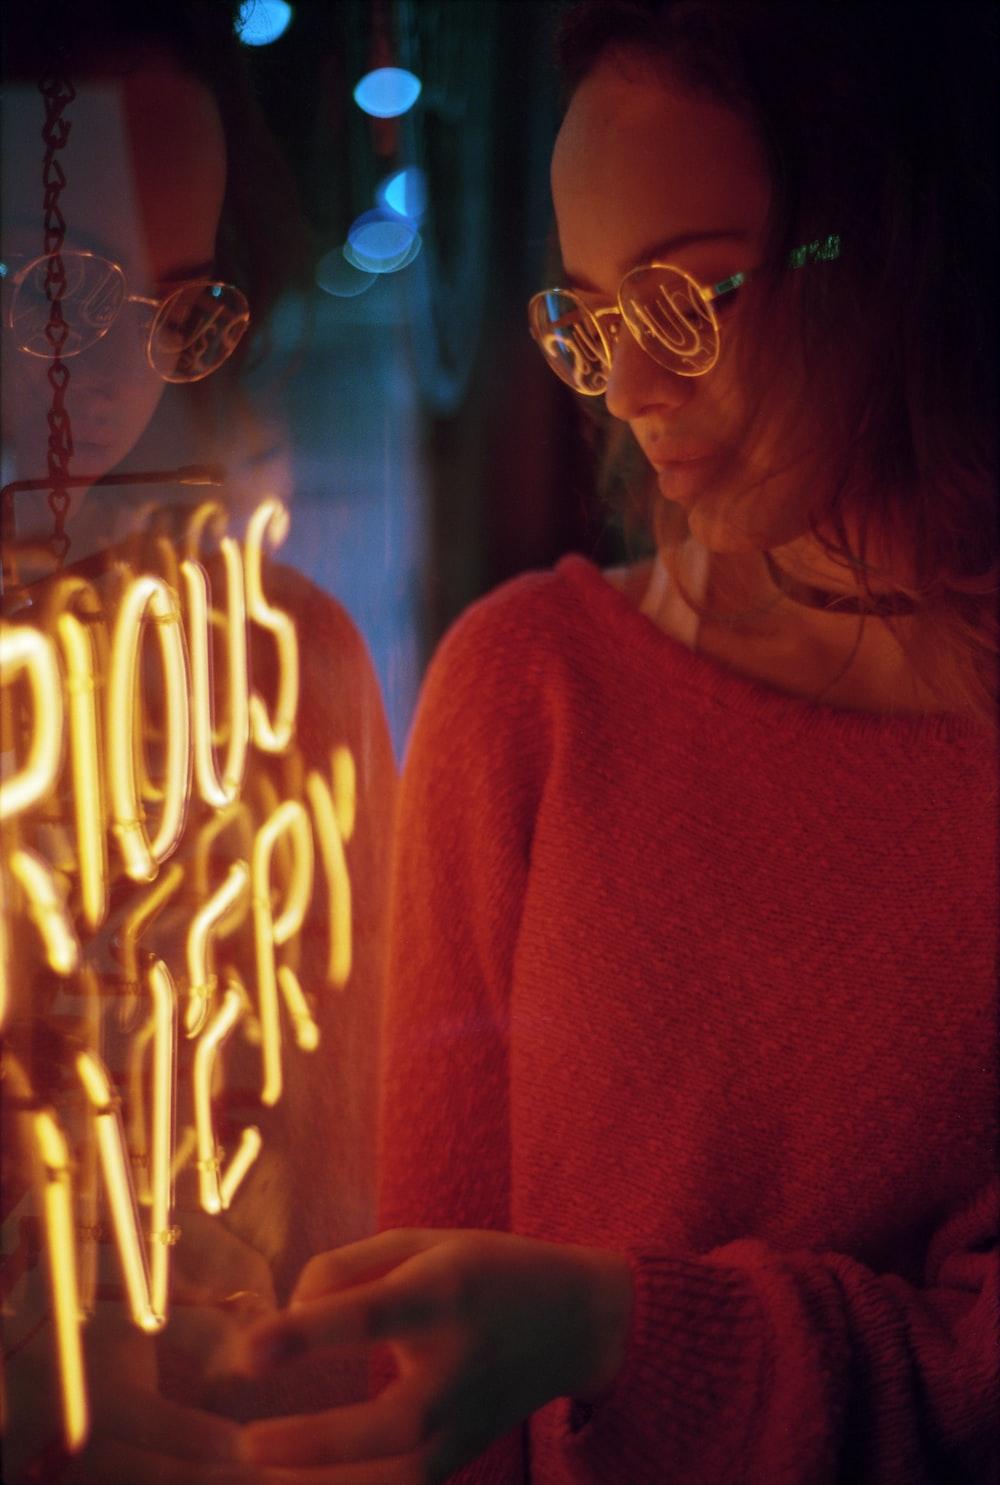 woman in red sweater wearing eyeglasses